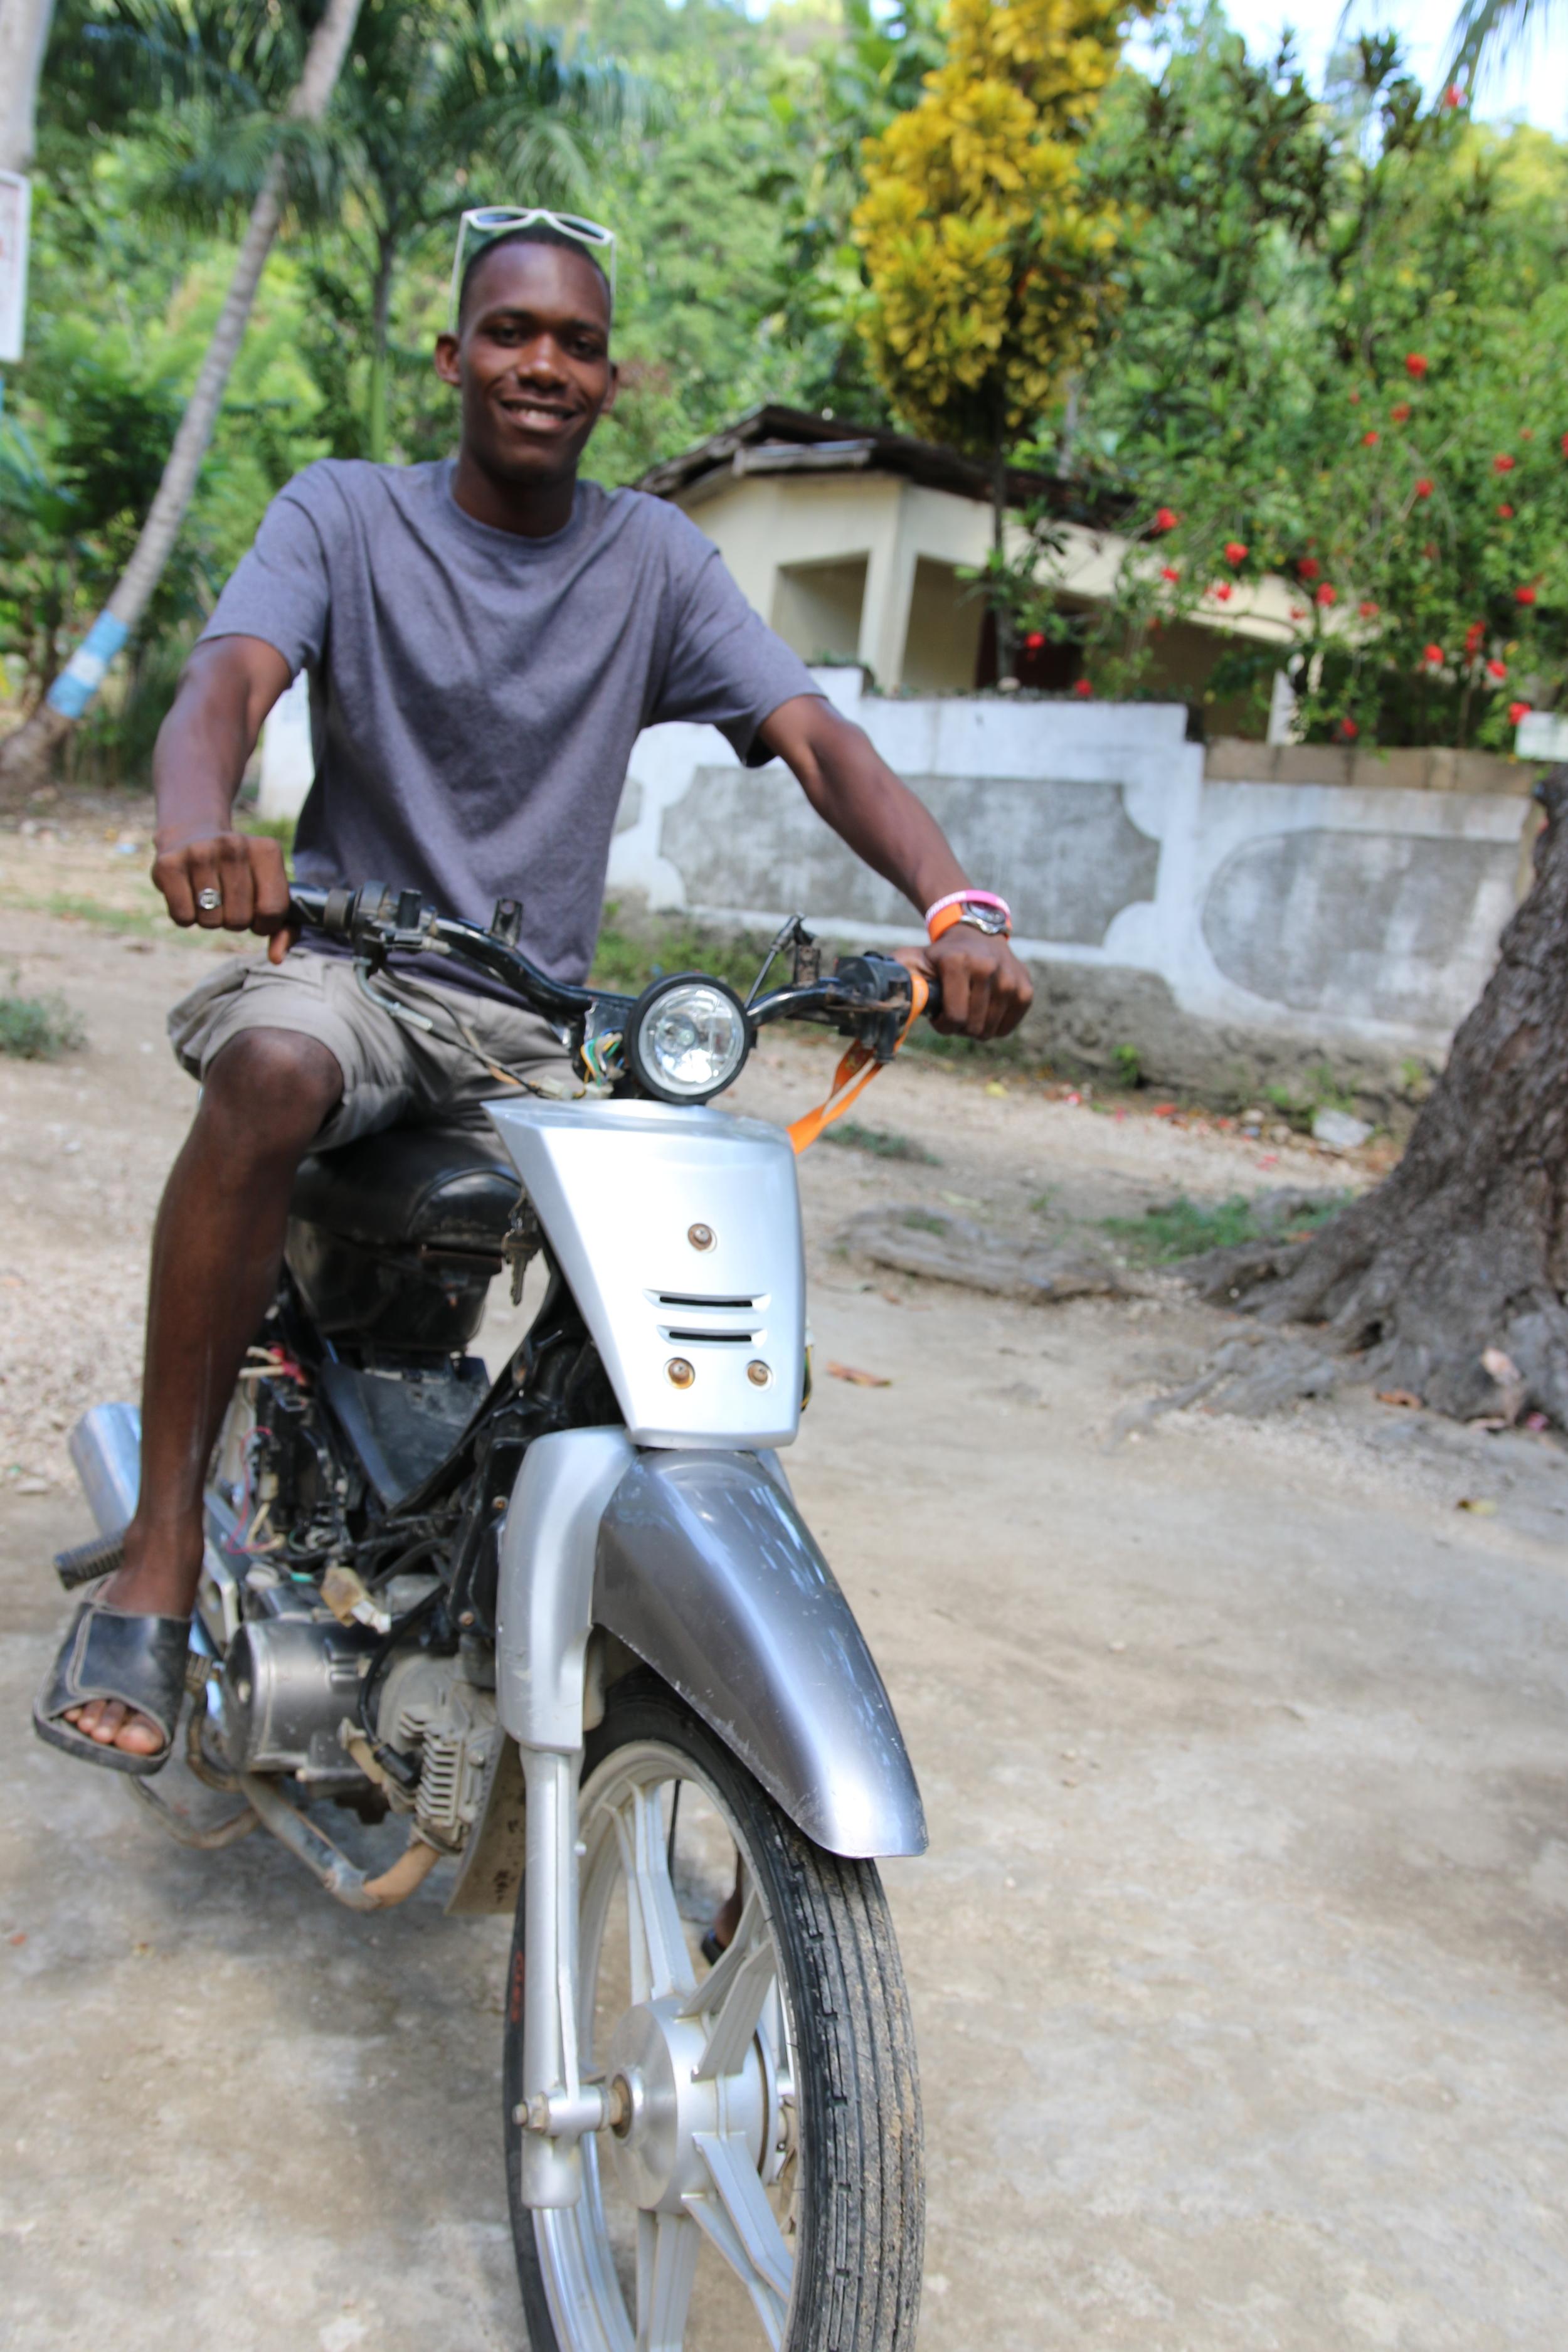 Haitian on a motorbike in Bassin Bleu